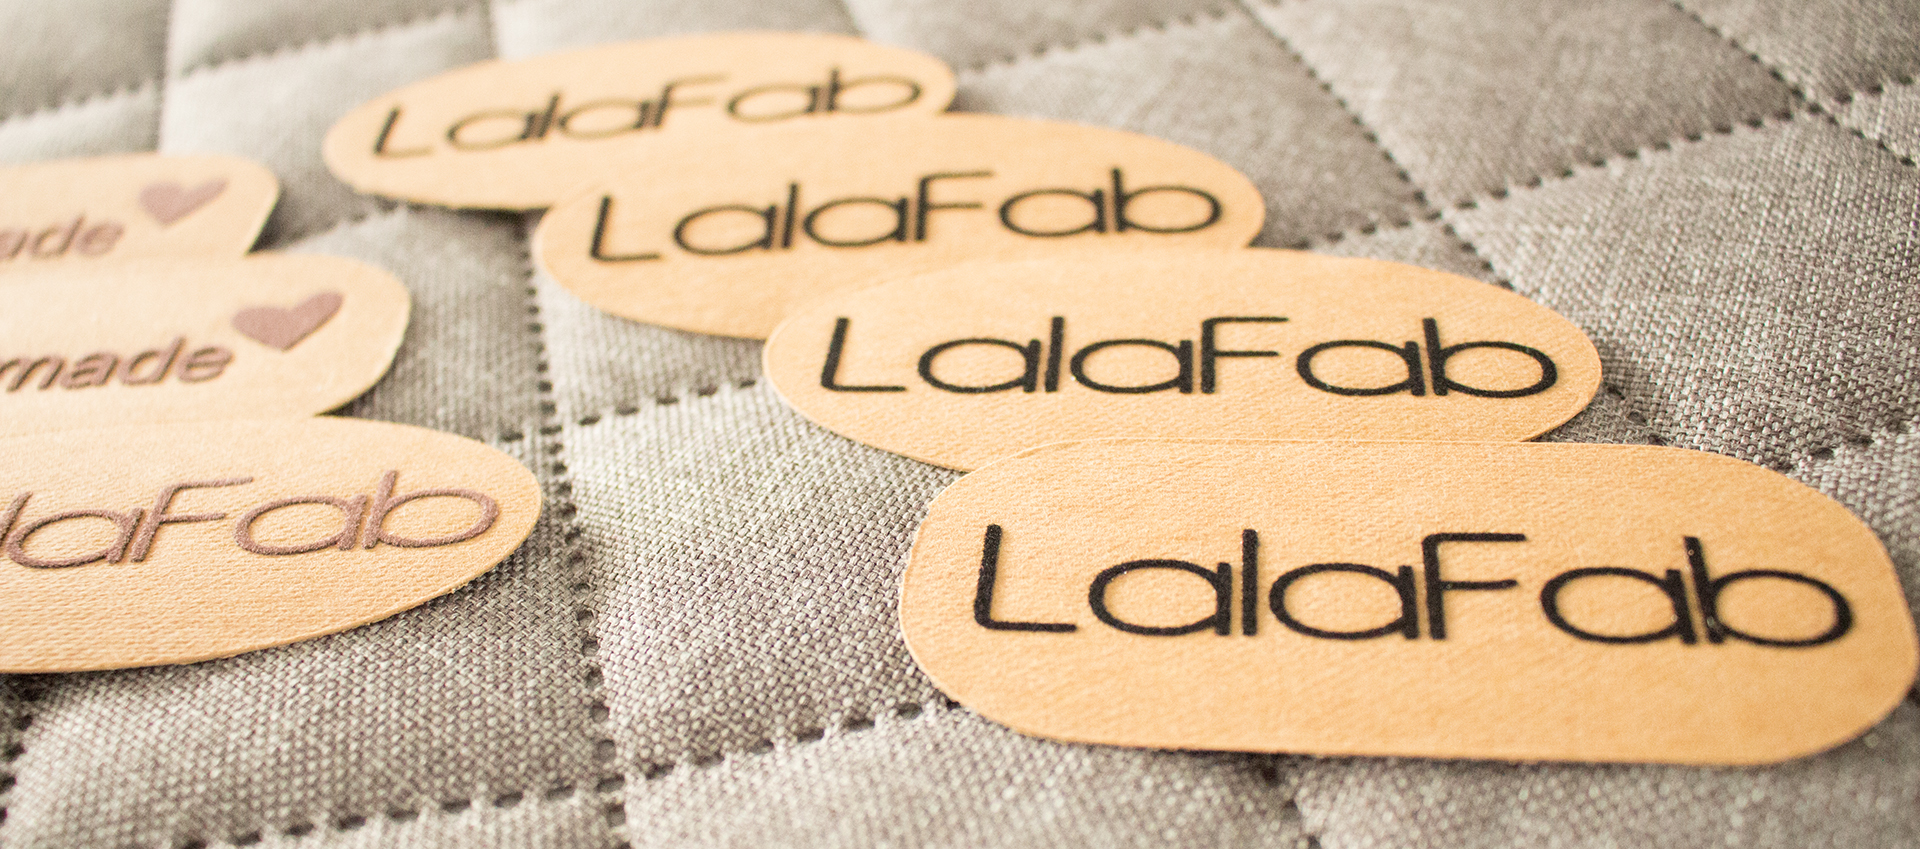 mini diy labels aus snap pap selbst herstellen lalafab. Black Bedroom Furniture Sets. Home Design Ideas